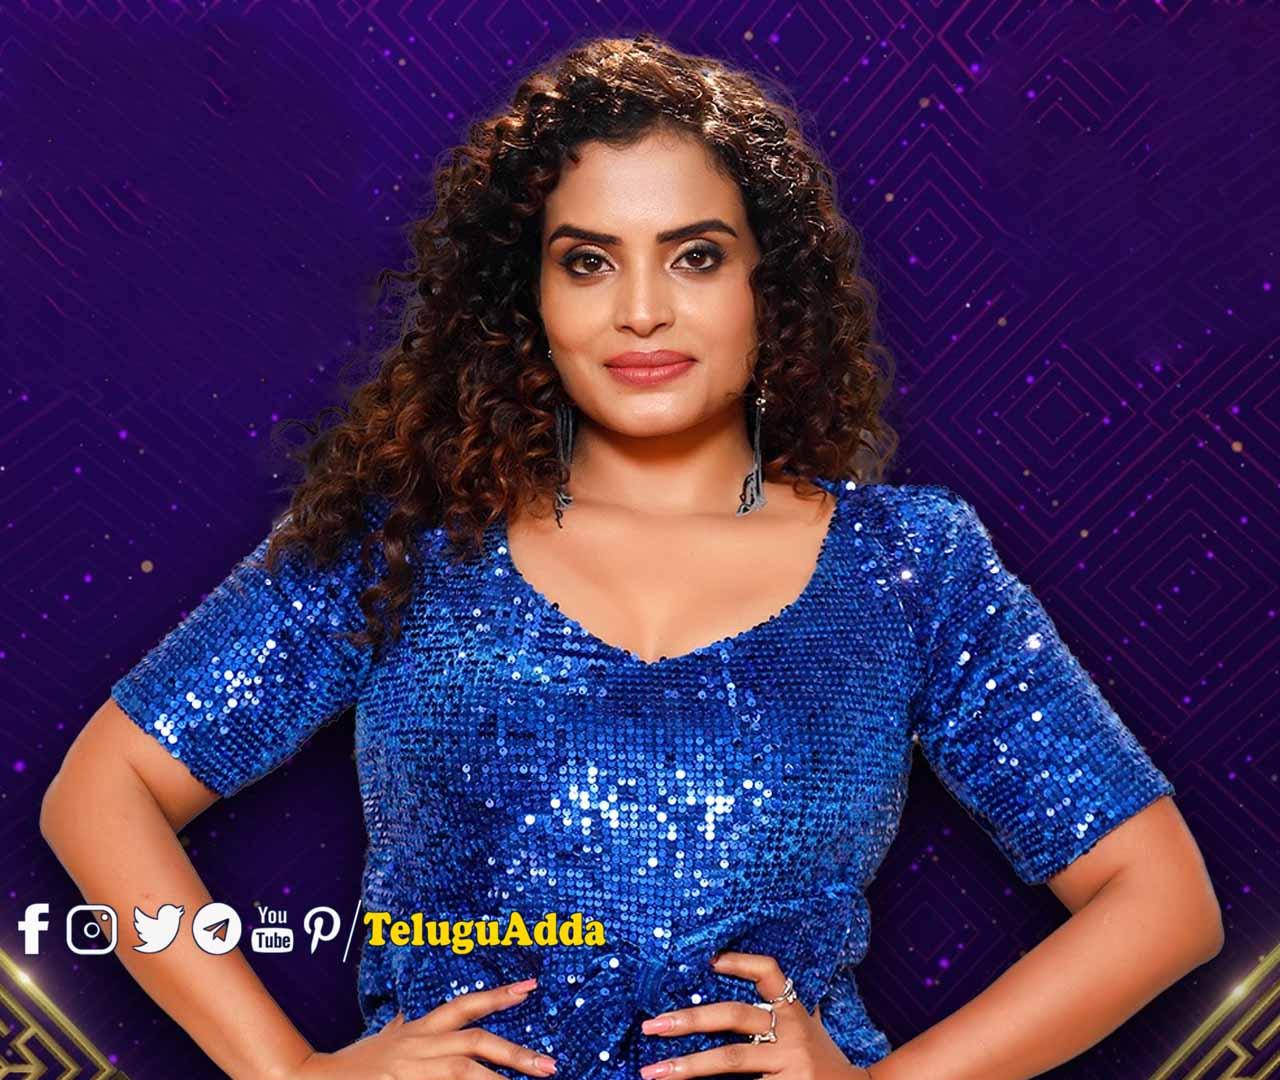 Bigg Boss 5 Telugu 13th contestant sarayu